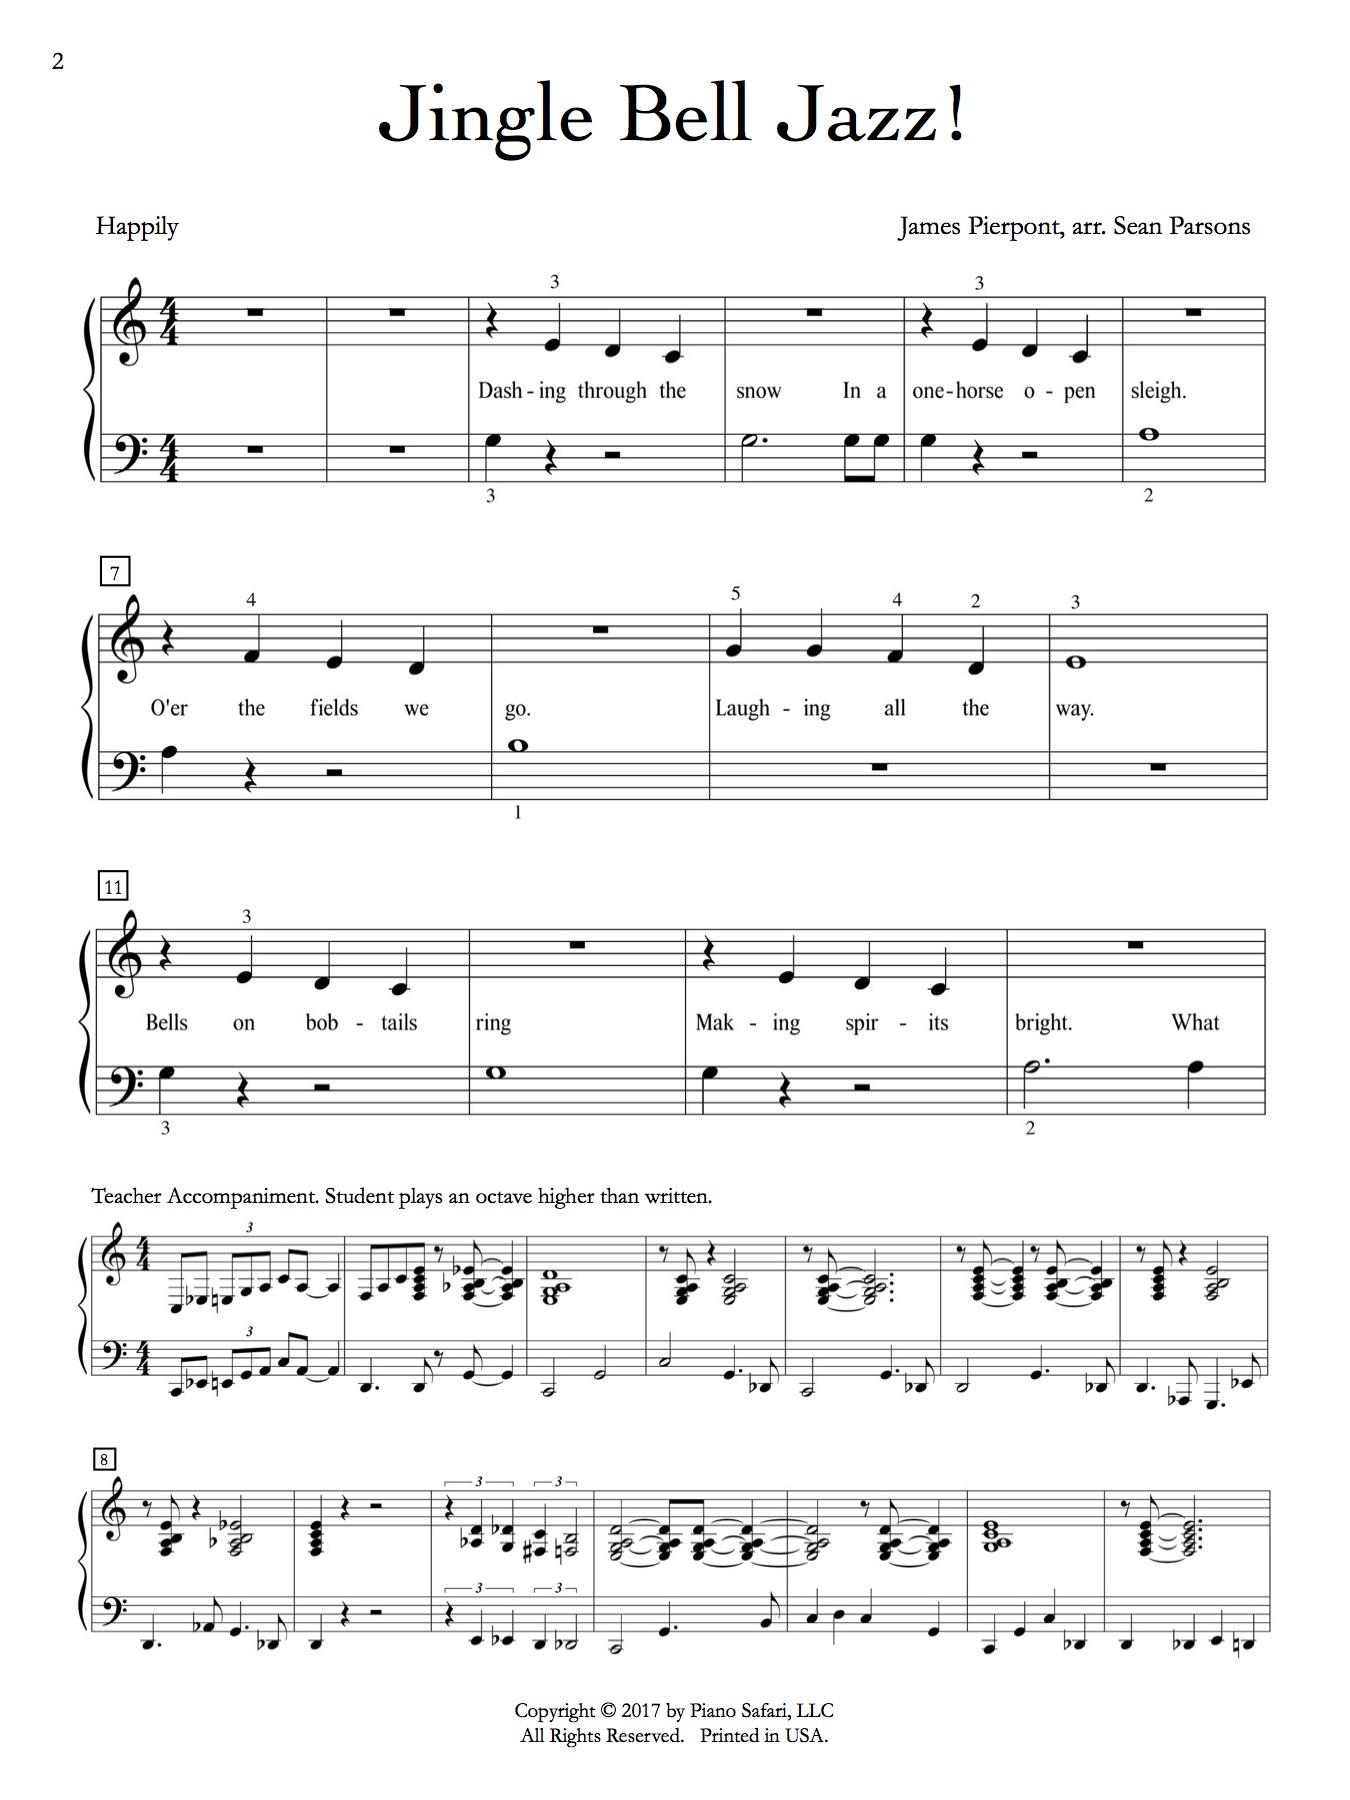 jingle bell jazz! – piano safari